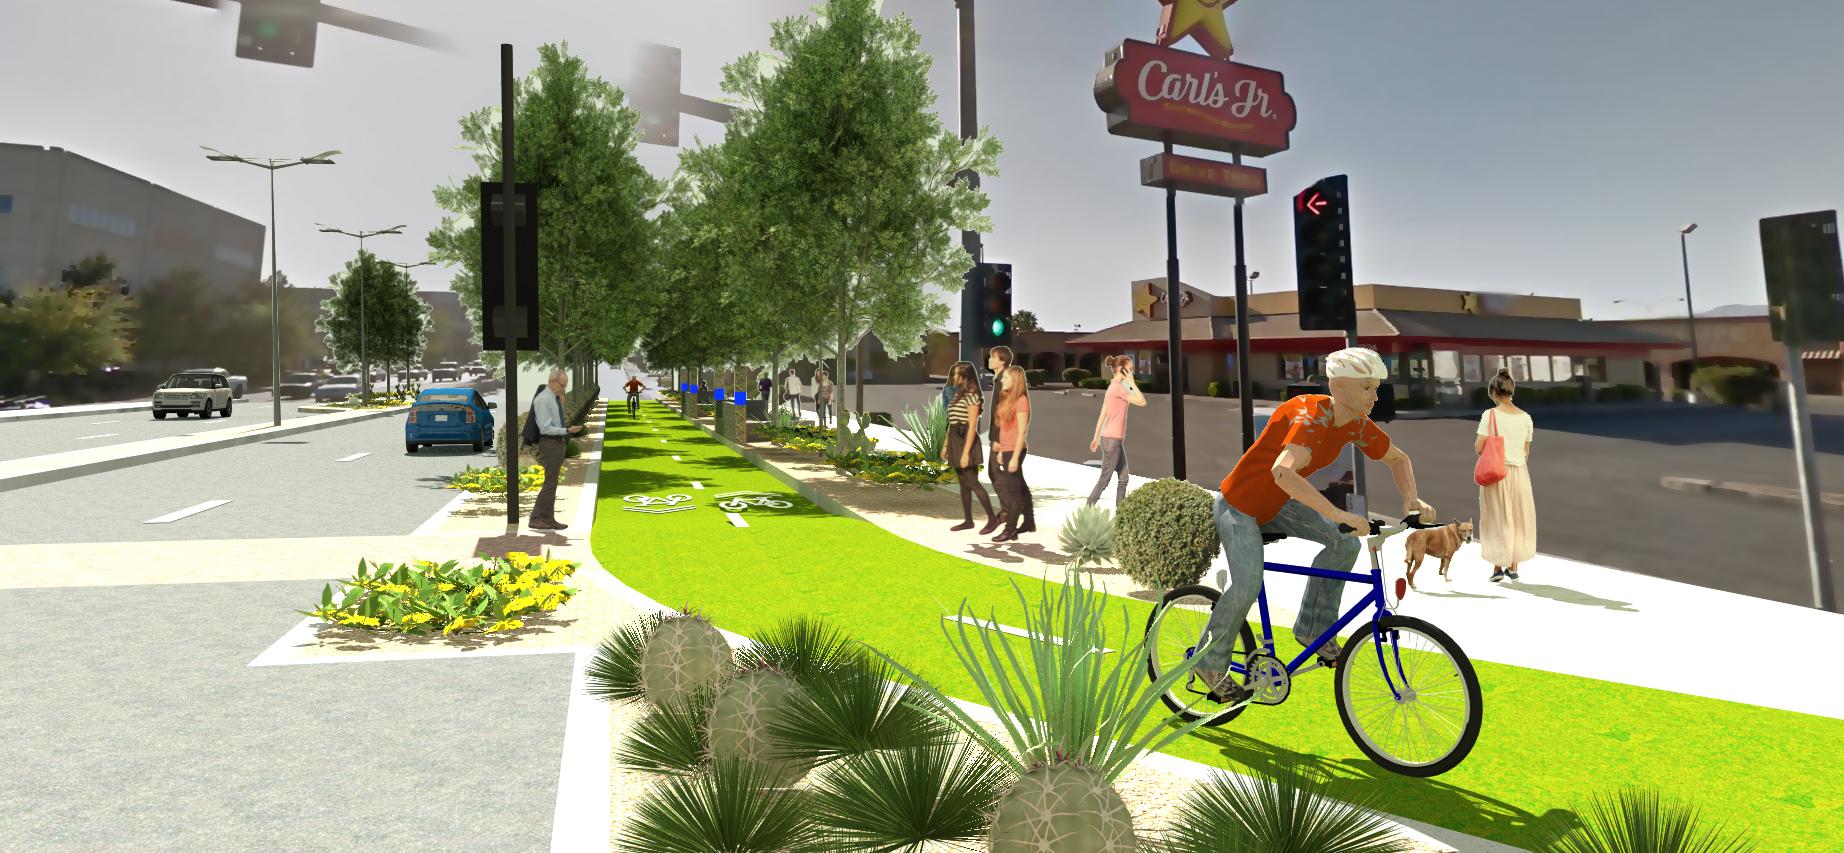 CNLV-complete-streets-lk mead mcdaniel 02